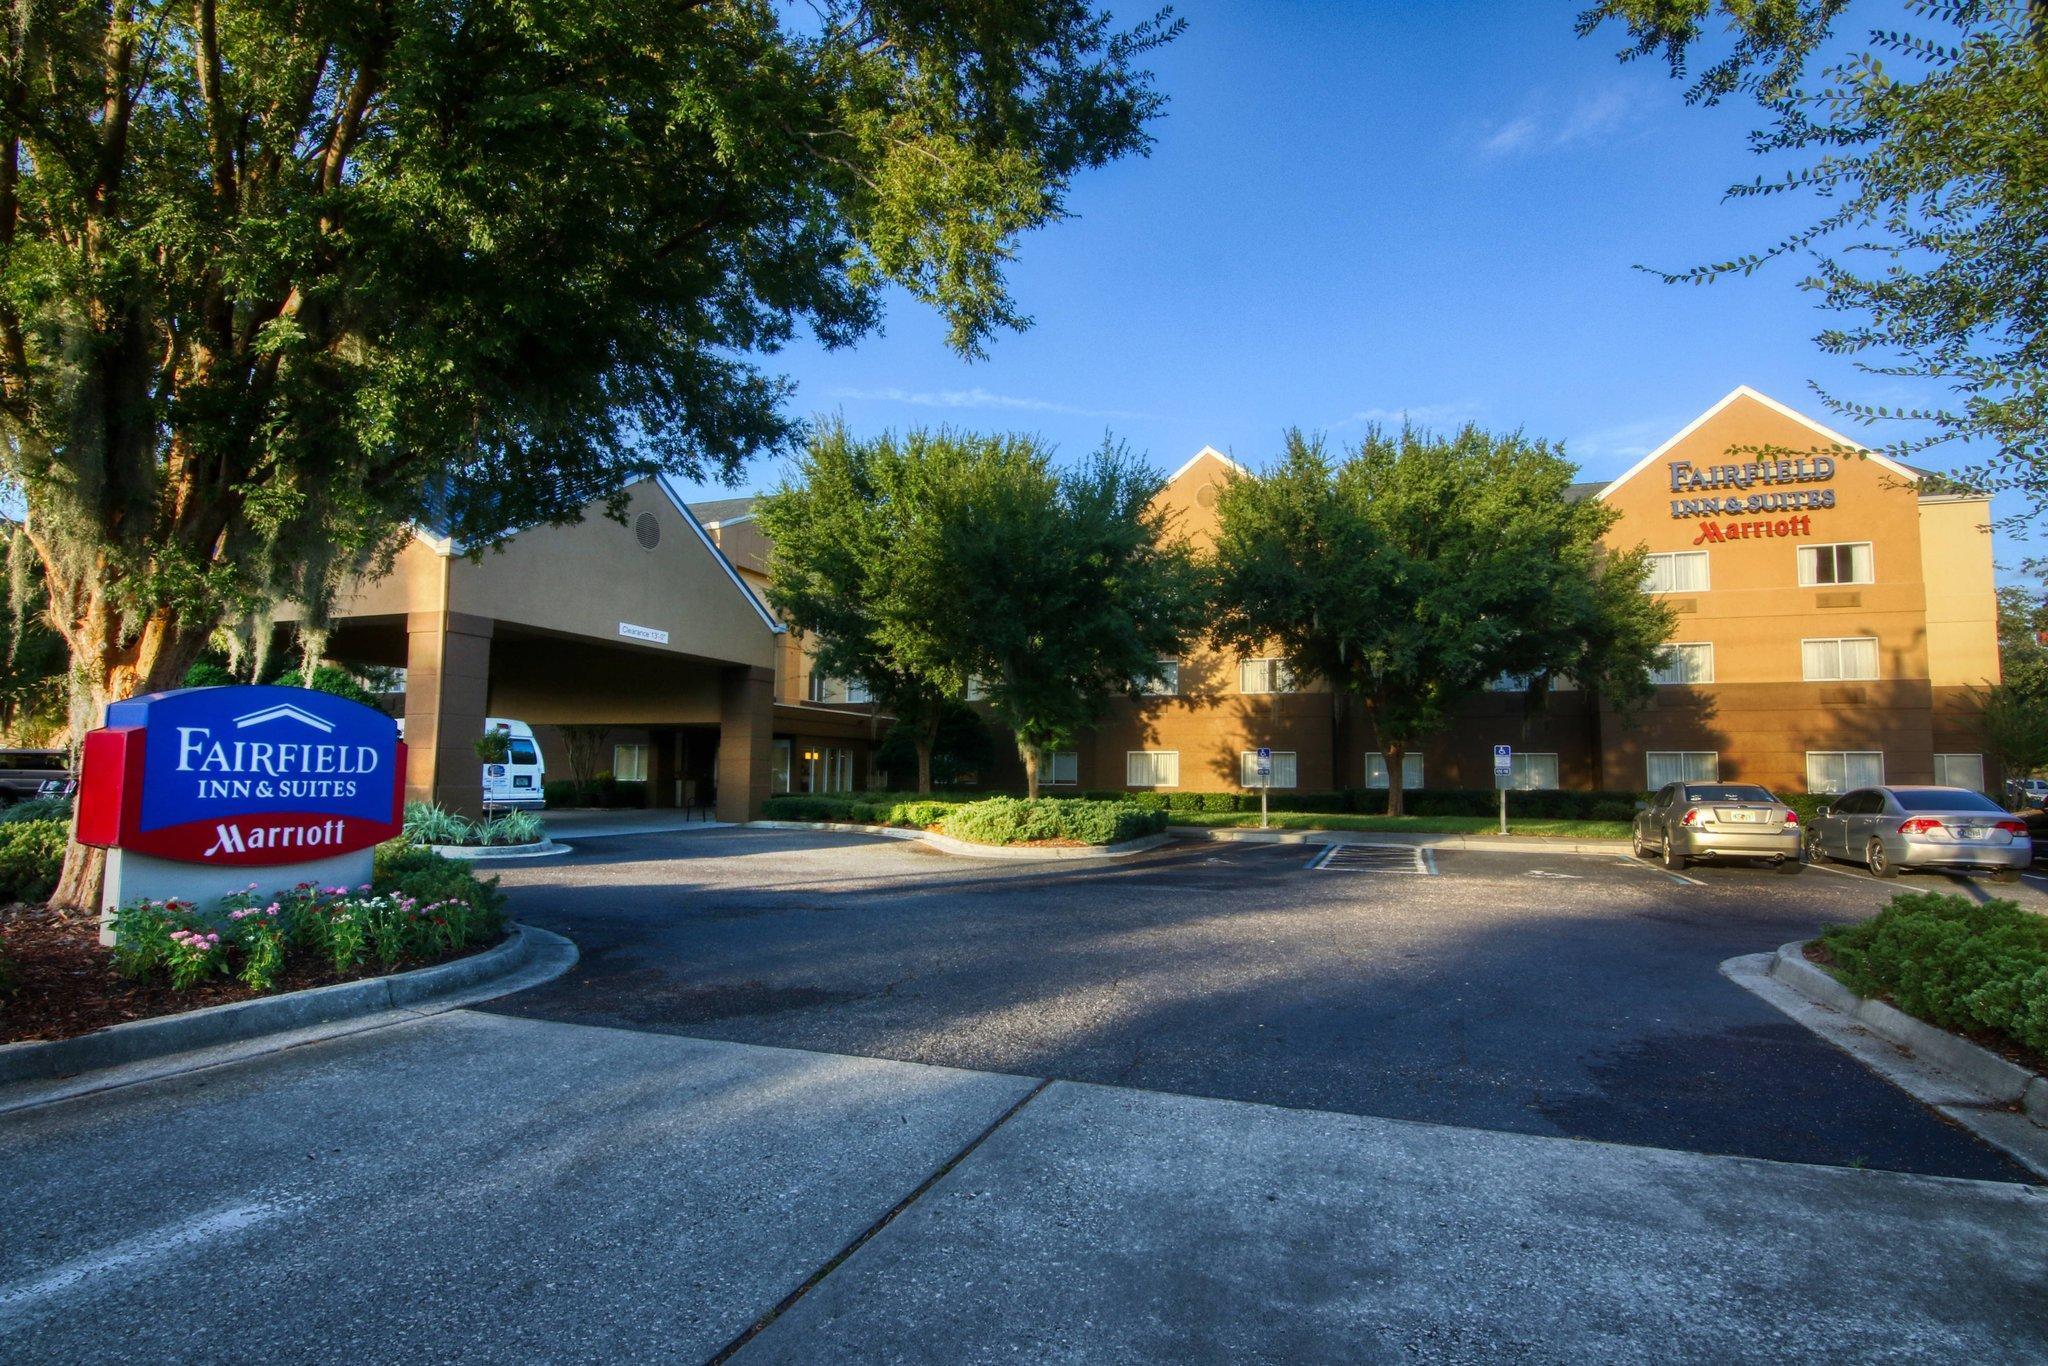 Fairfield Inn And Suites Jacksonville Airport